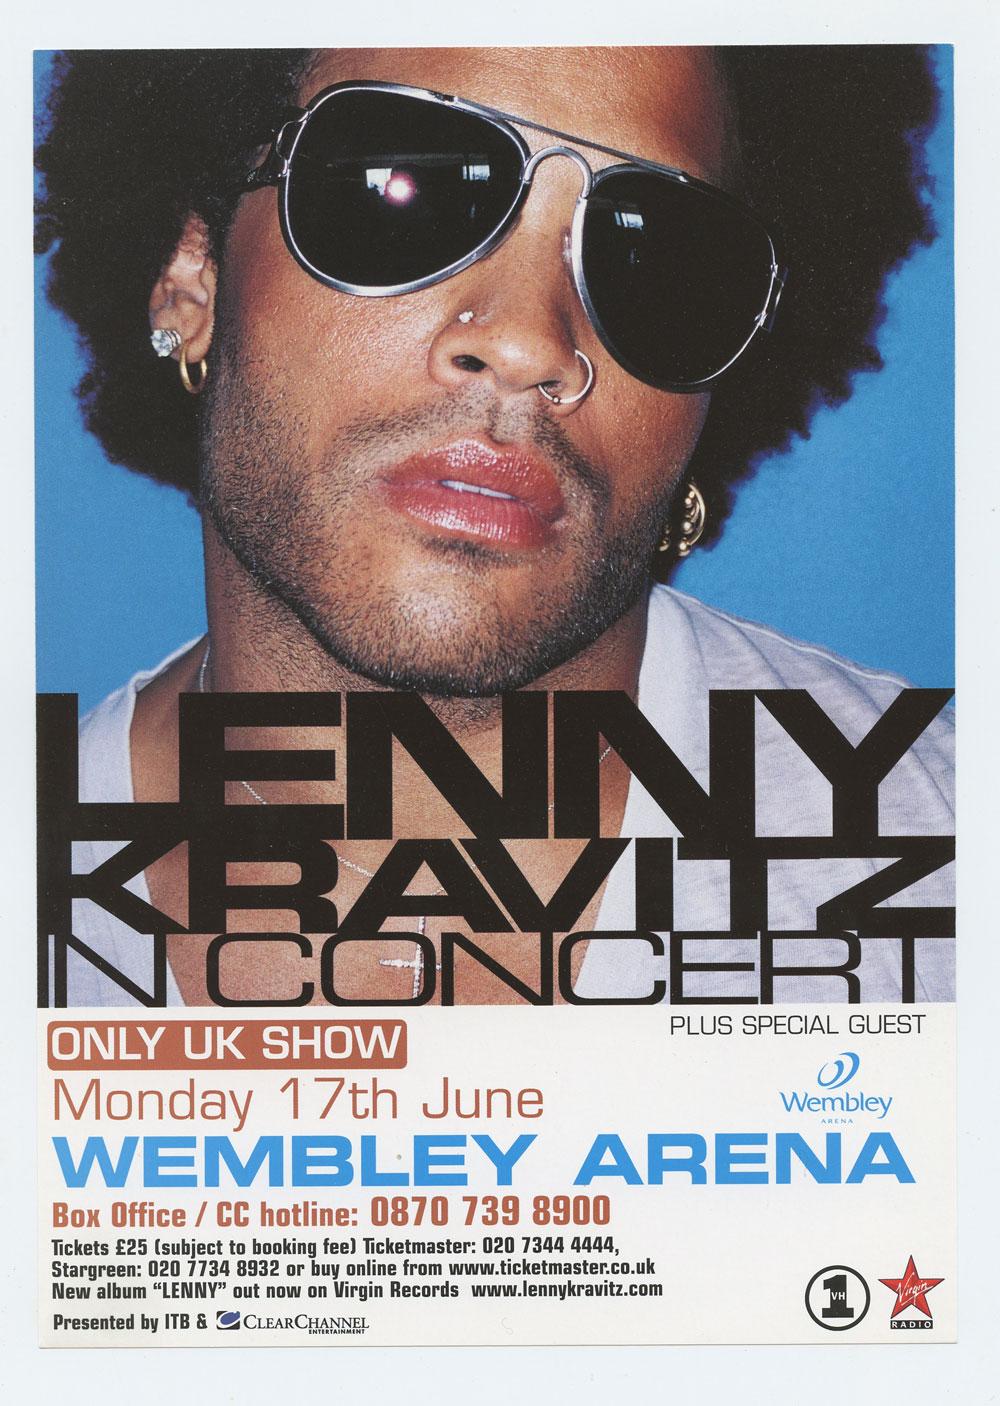 Lenny Kravitz Handbill 2002 June 17 Wembley Arena London UK